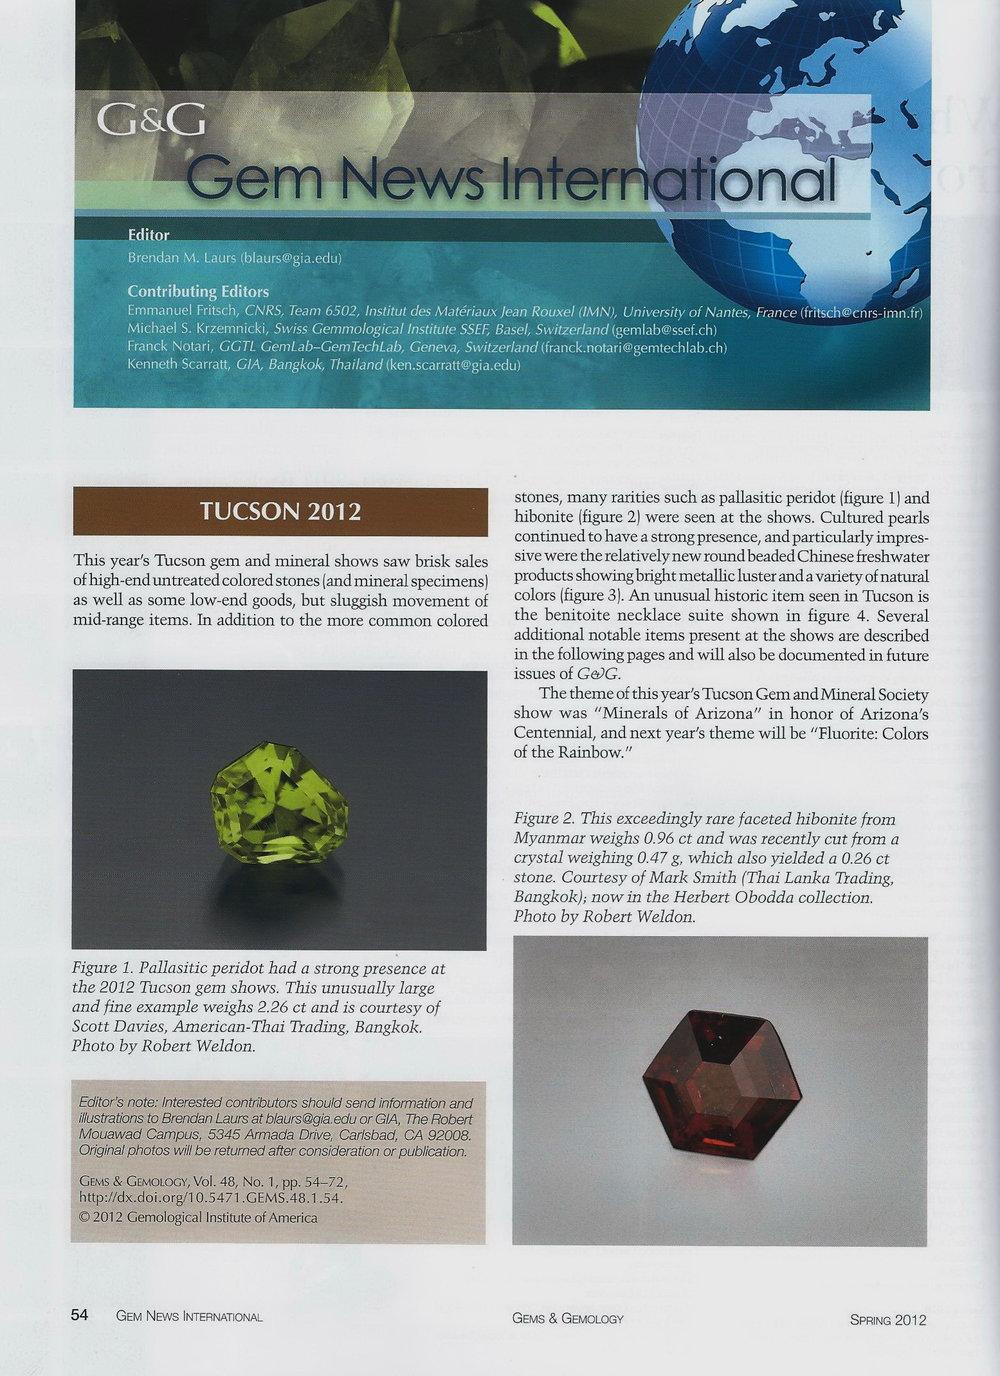 Gems & Gemology - Spring 2012